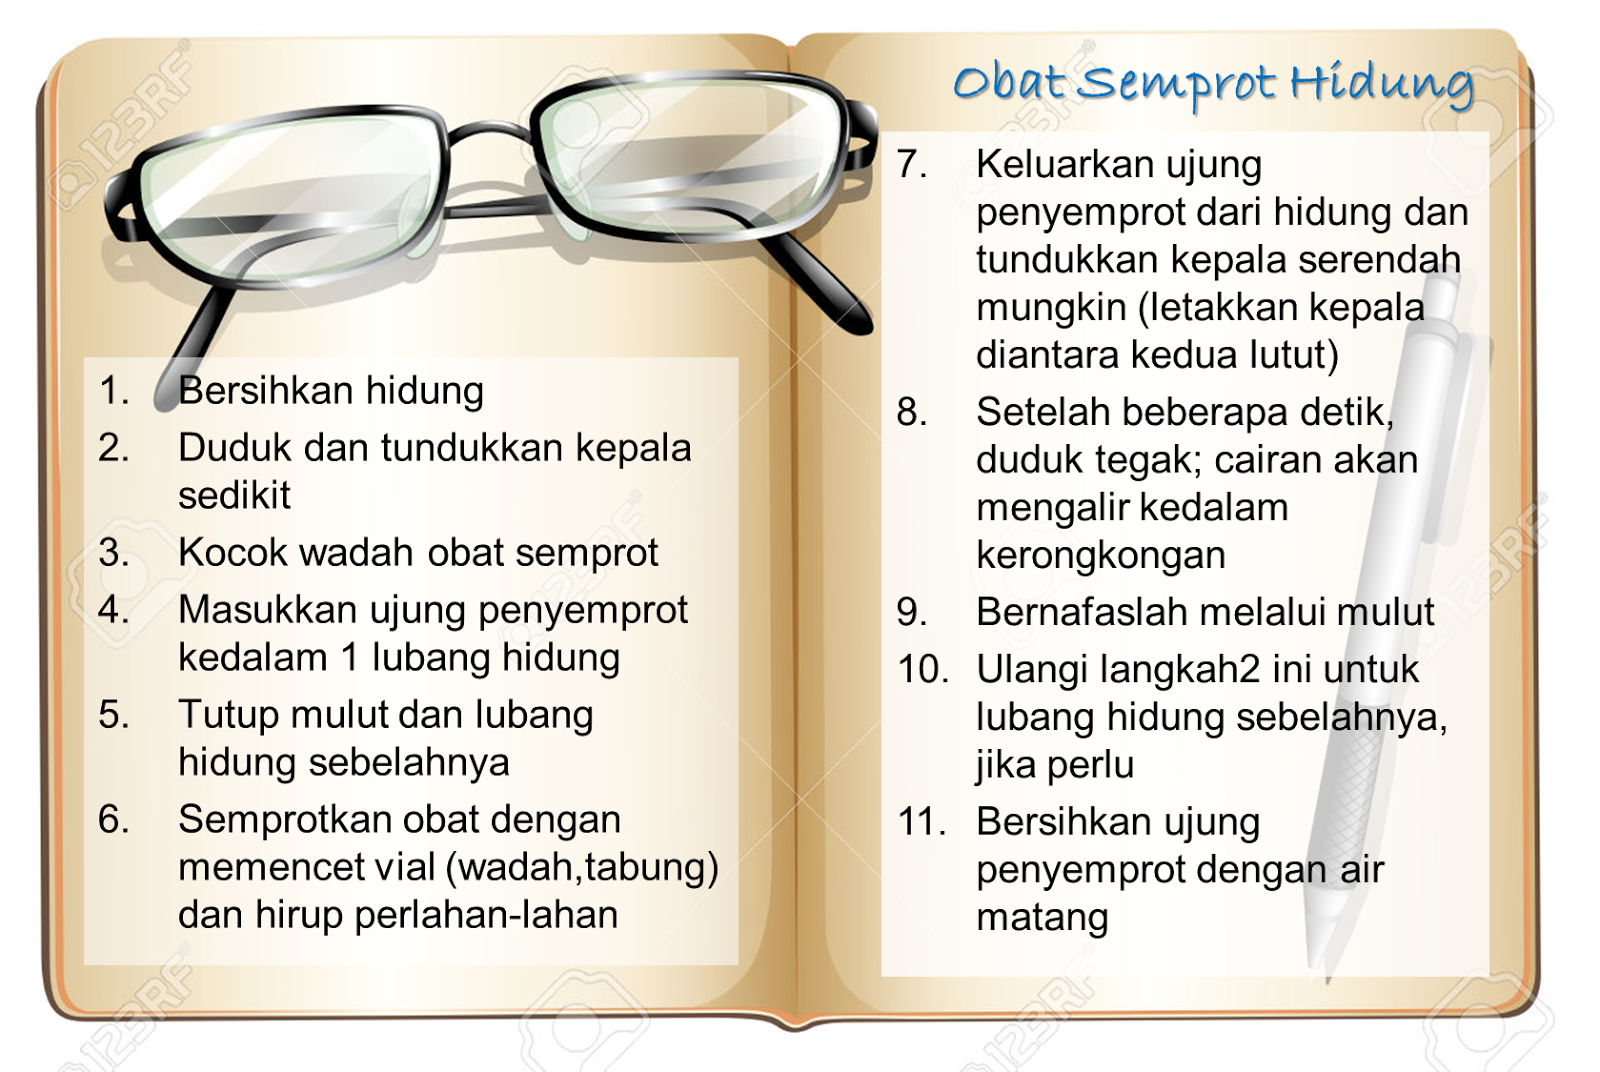 kortikosteroid topikal di indonesia